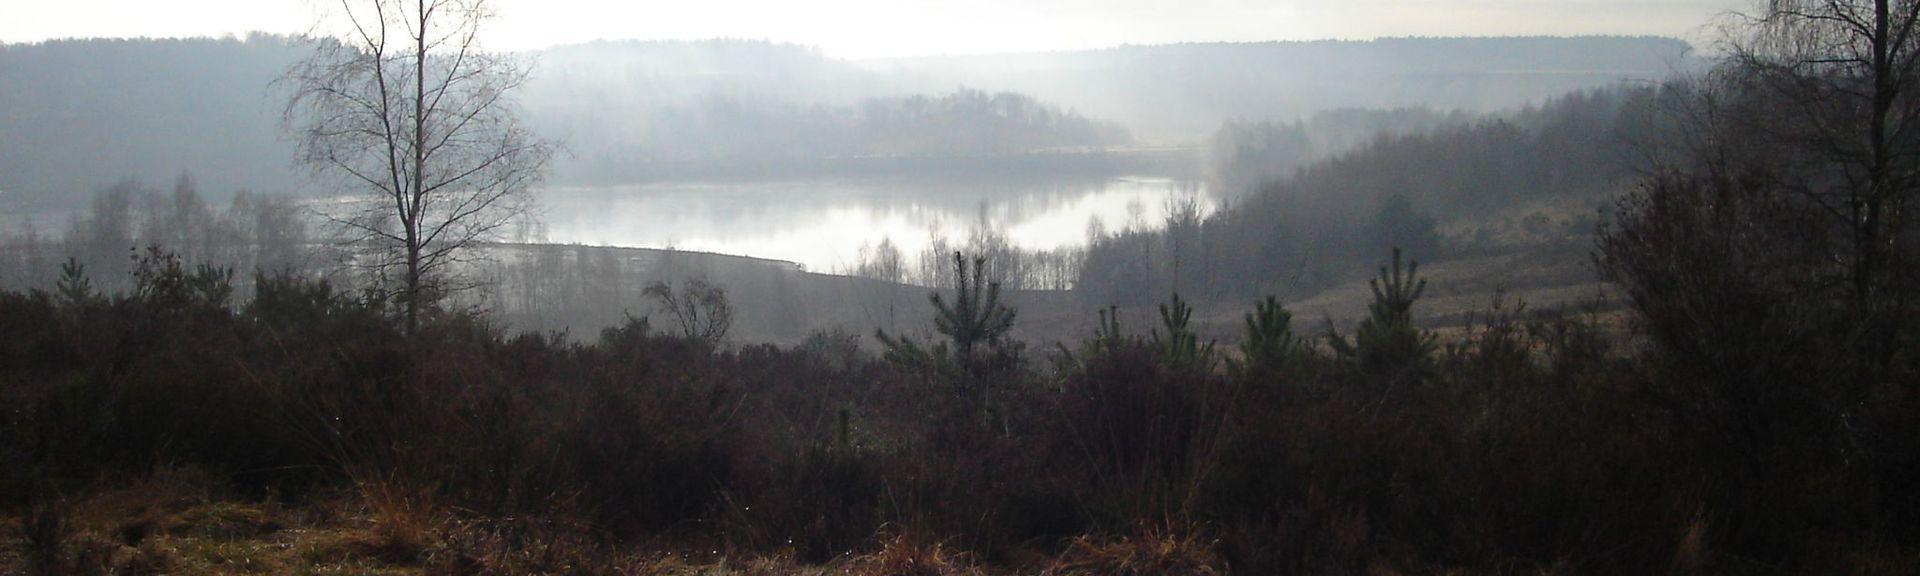 Maaseik, Flämische Region, Belgien